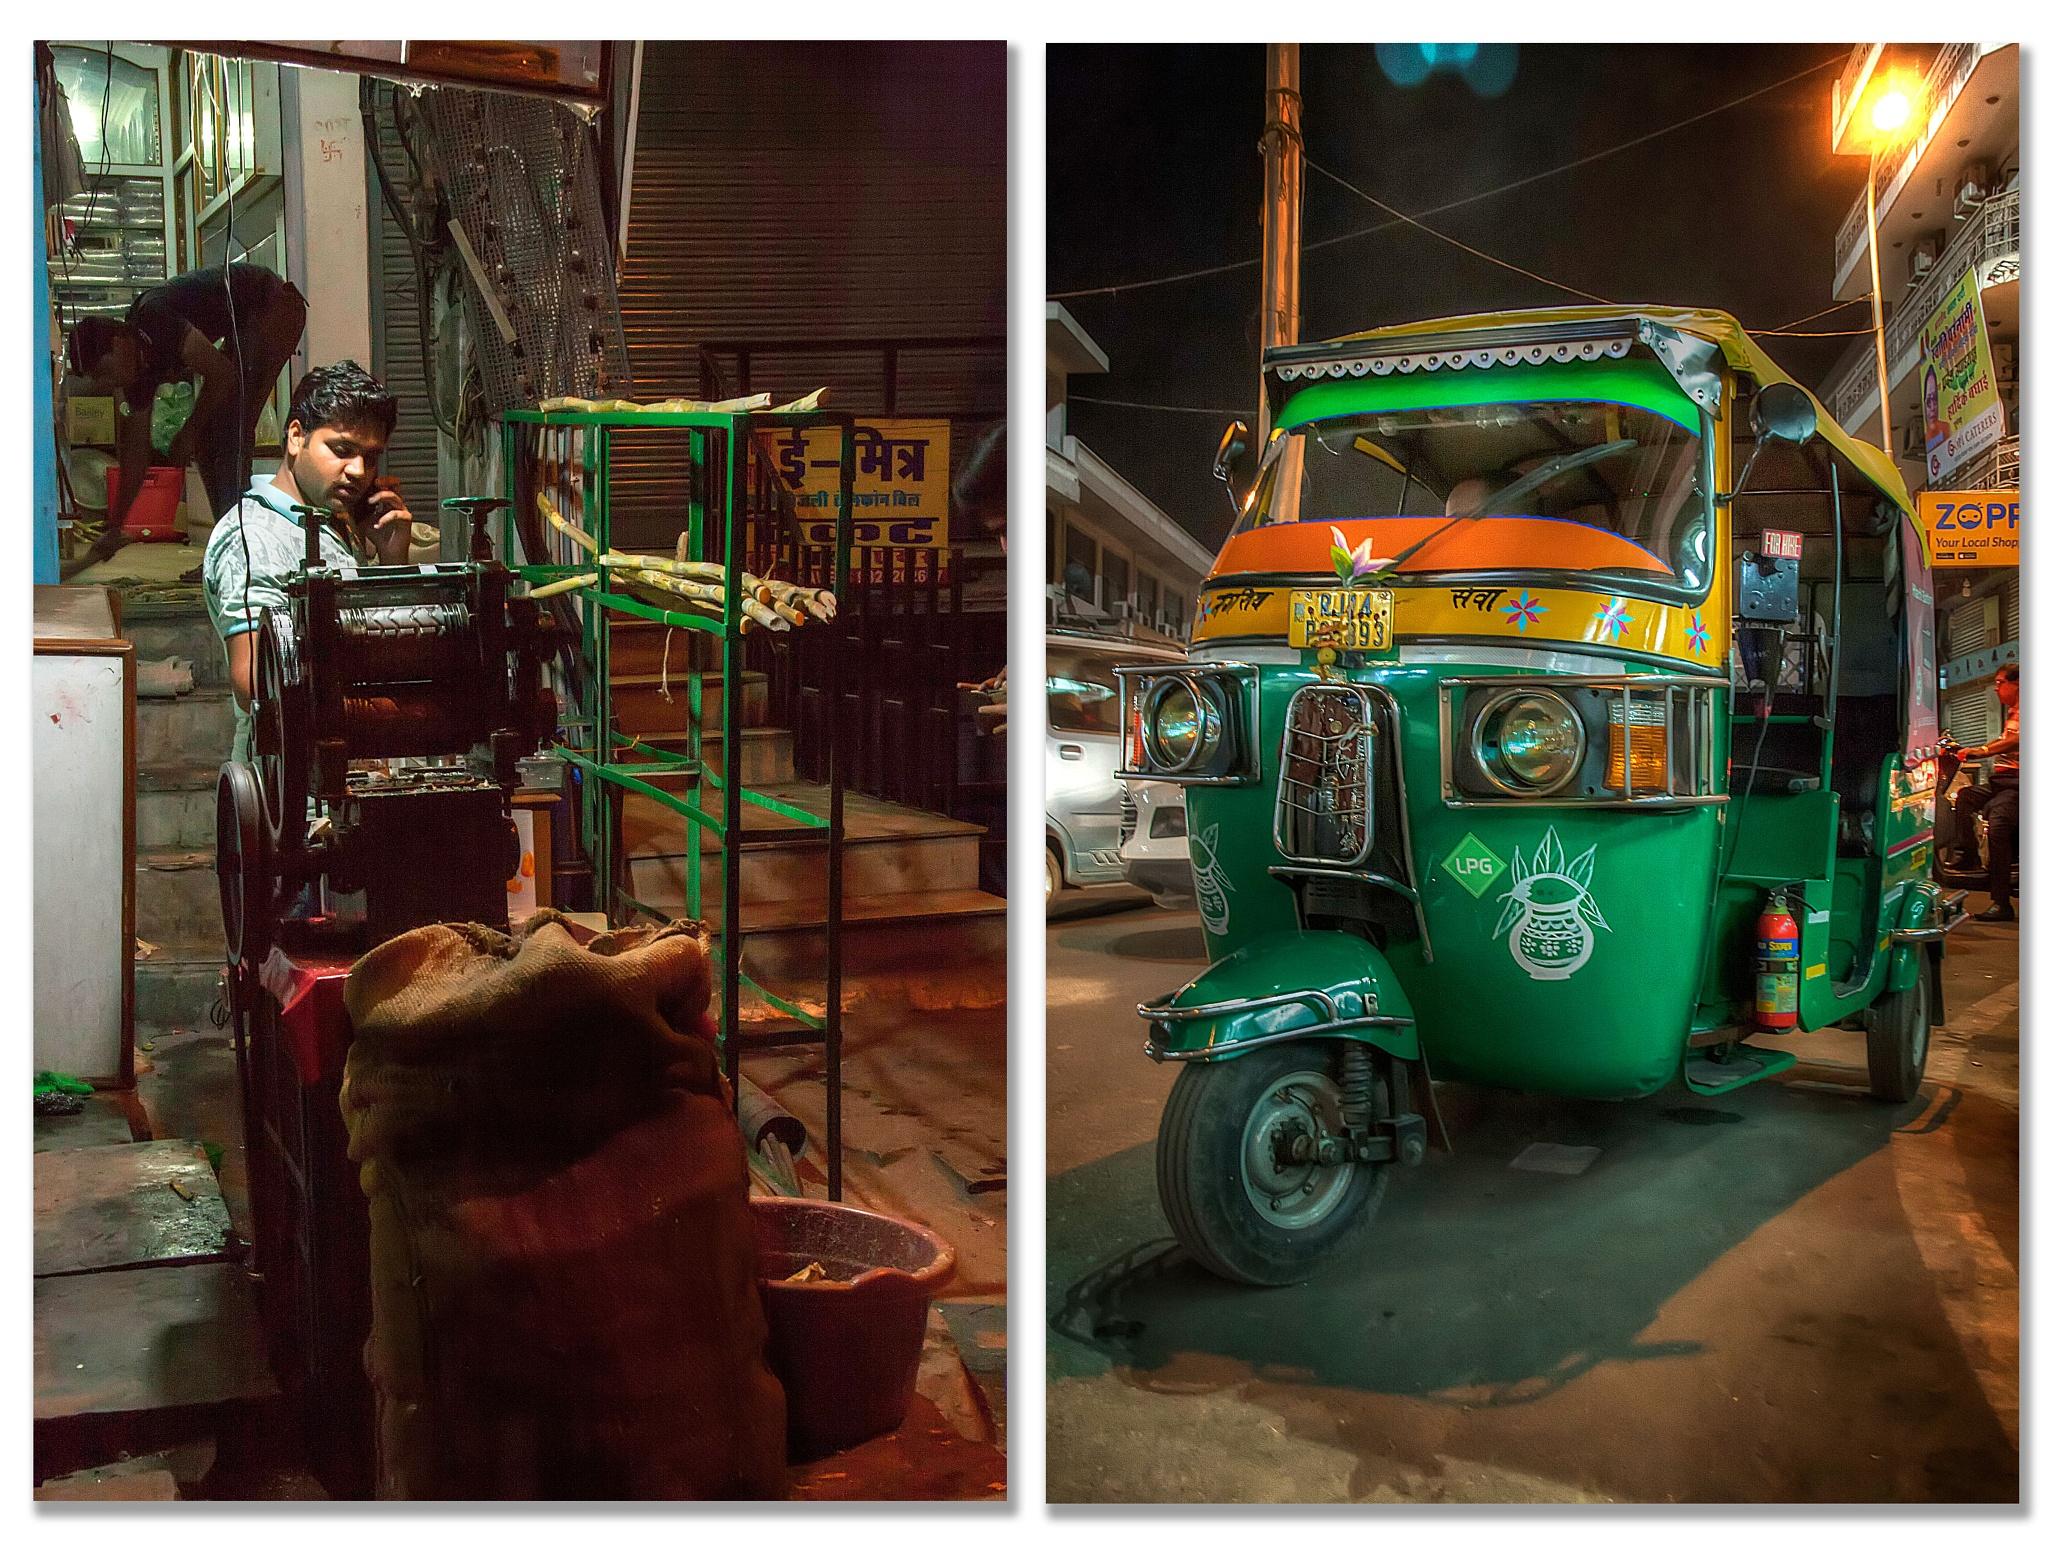 Sugarcane & Tuktuk's by Willpower